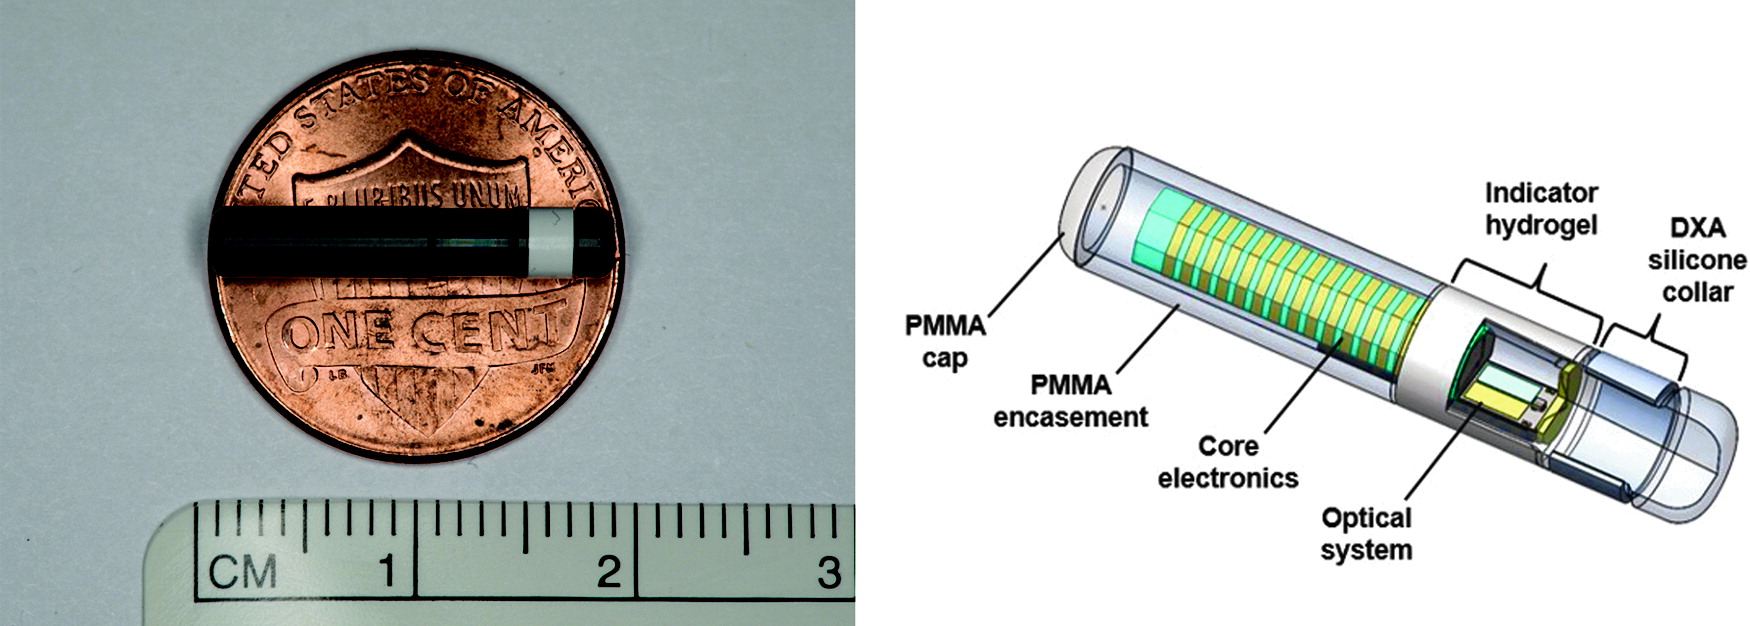 Glukózový senzor Eversense CGM system